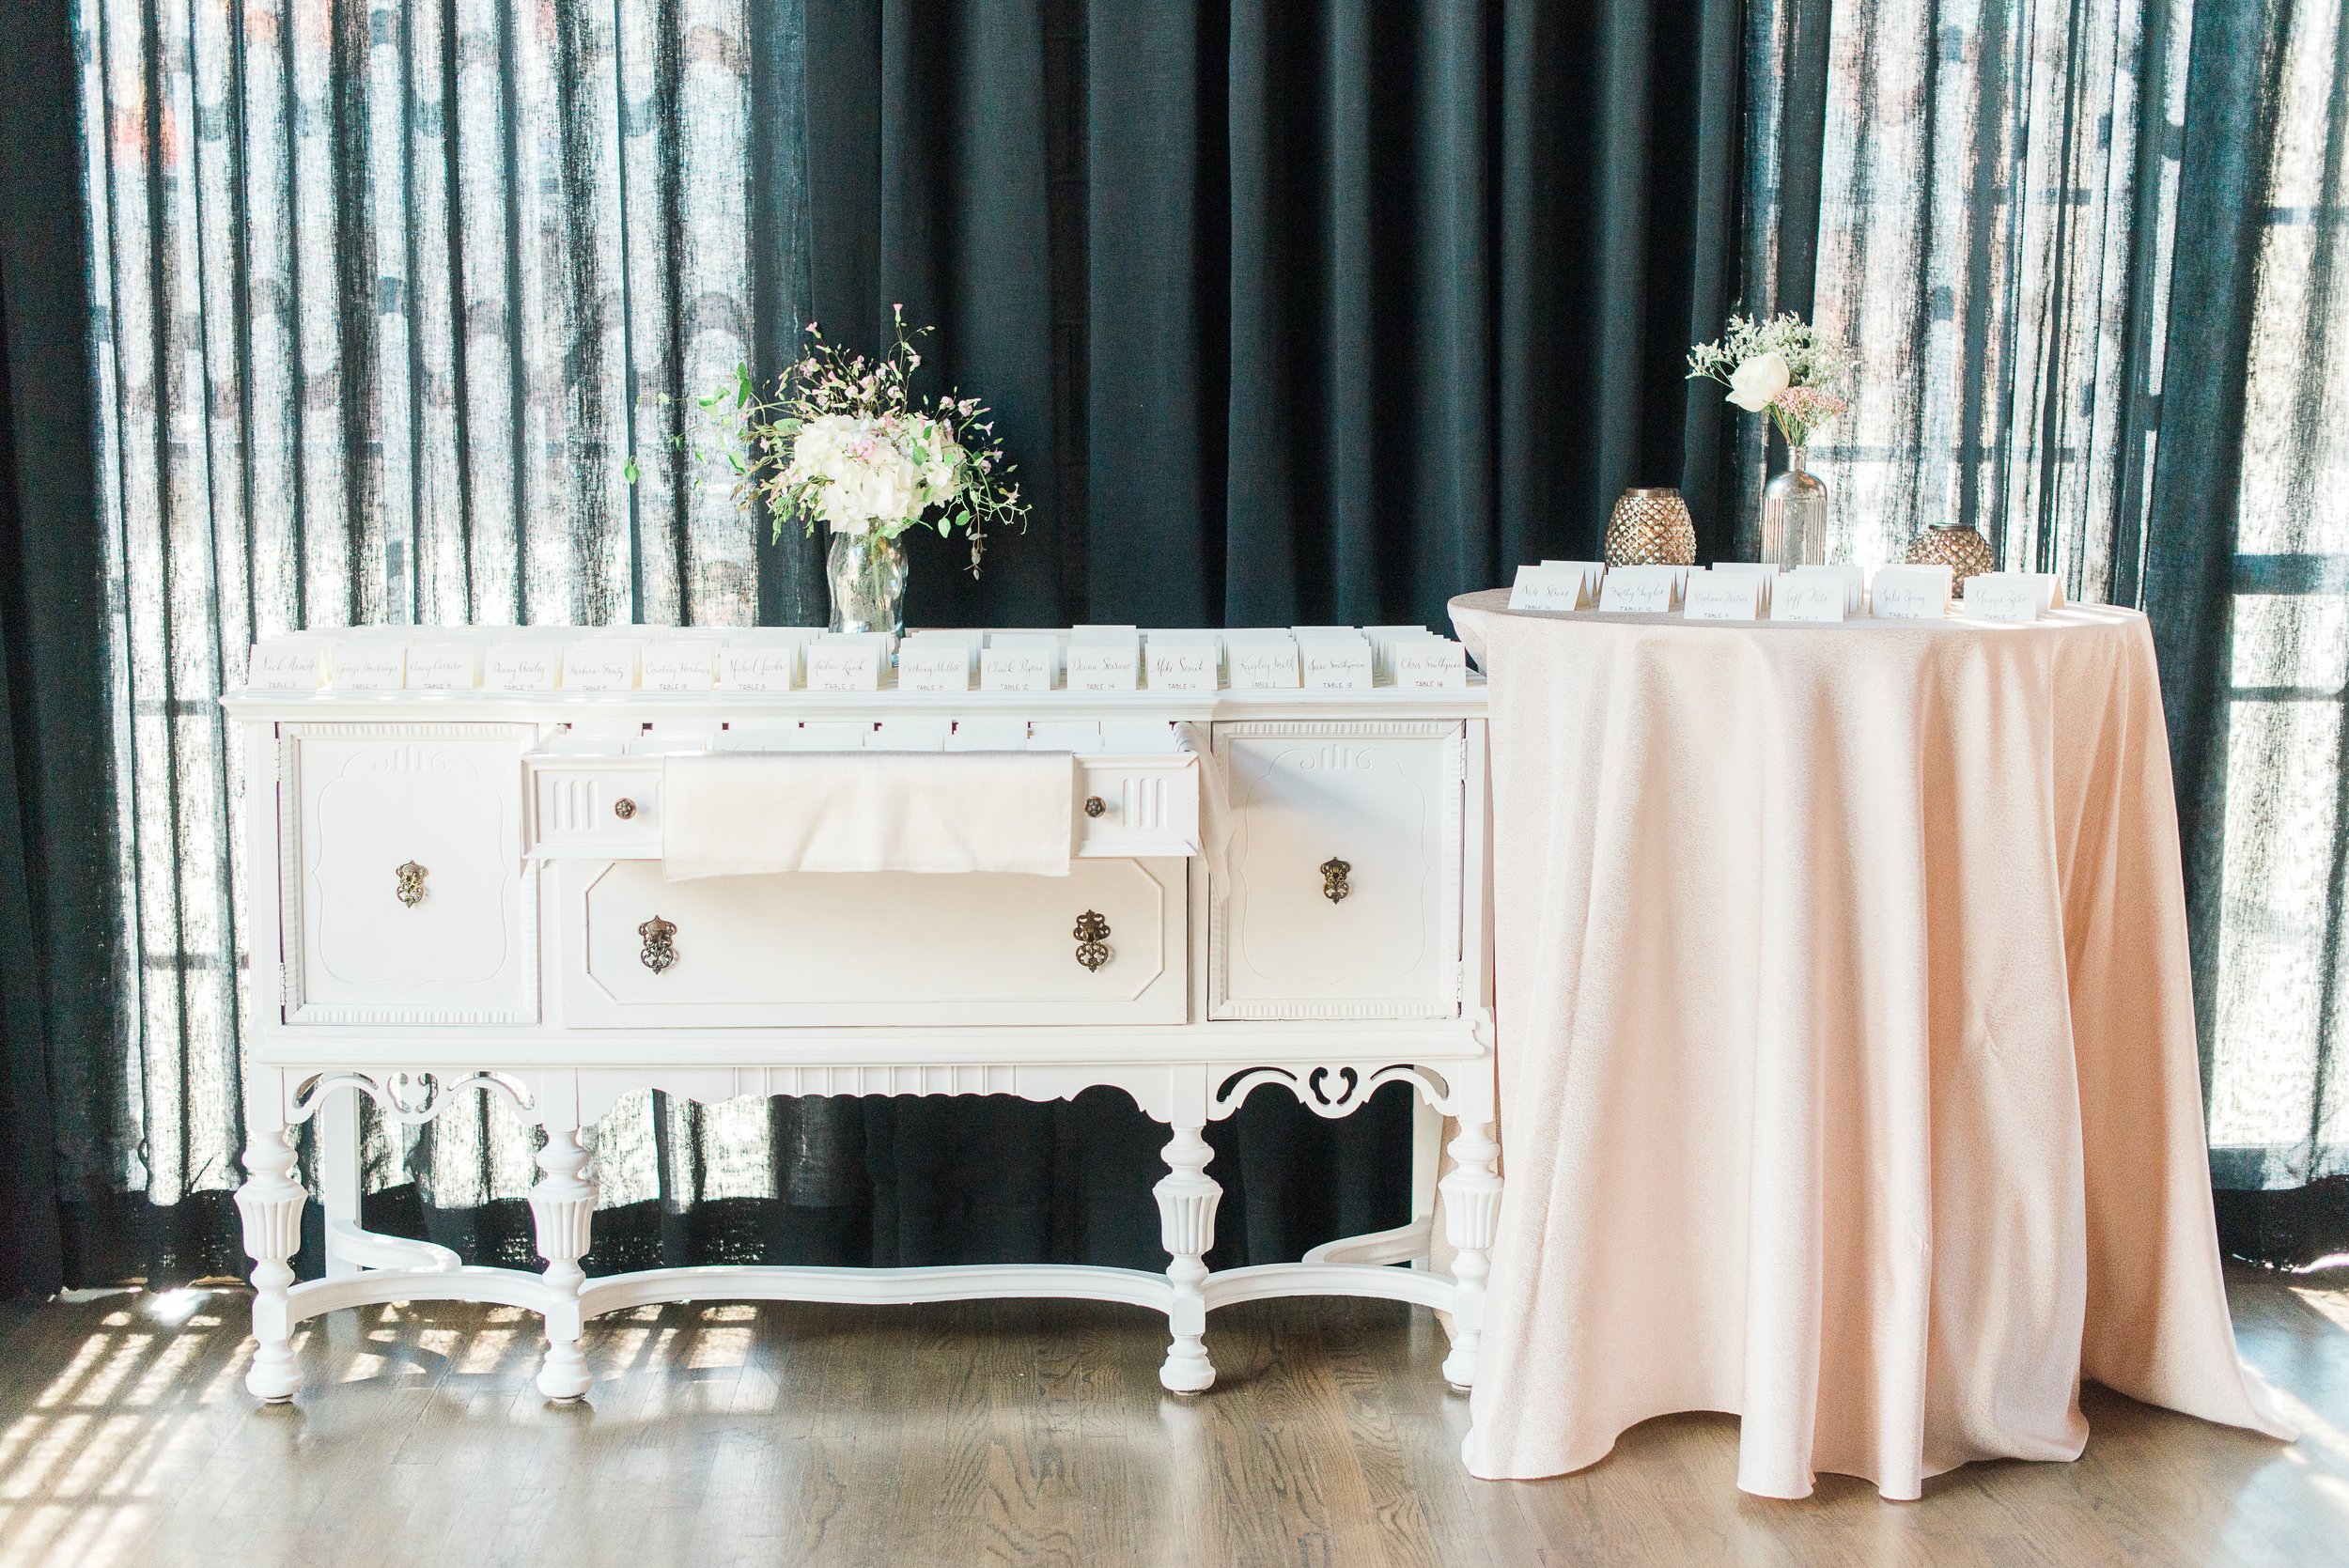 april-matt-married-highlights-2017-7-08 April Matt Wedding23177-116.jpg